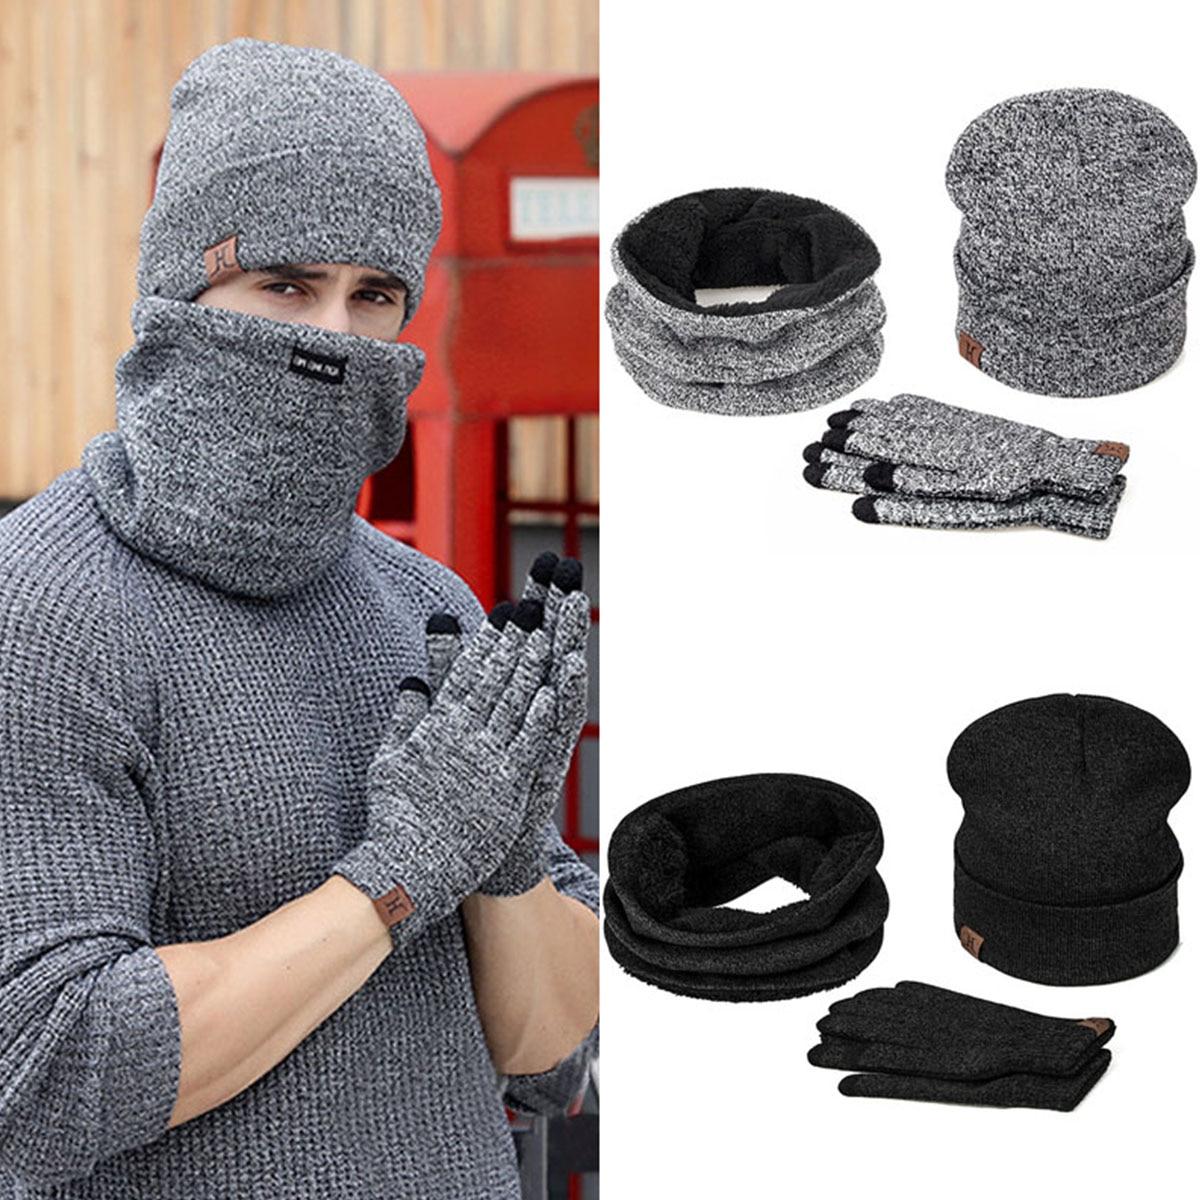 Iwinter Winter Beanie Hat For Men Women Hat Scarf Warm Scarf Hat Gloves Set Male Female Hat Scarf Set 3 Pcs Skullies Beanies